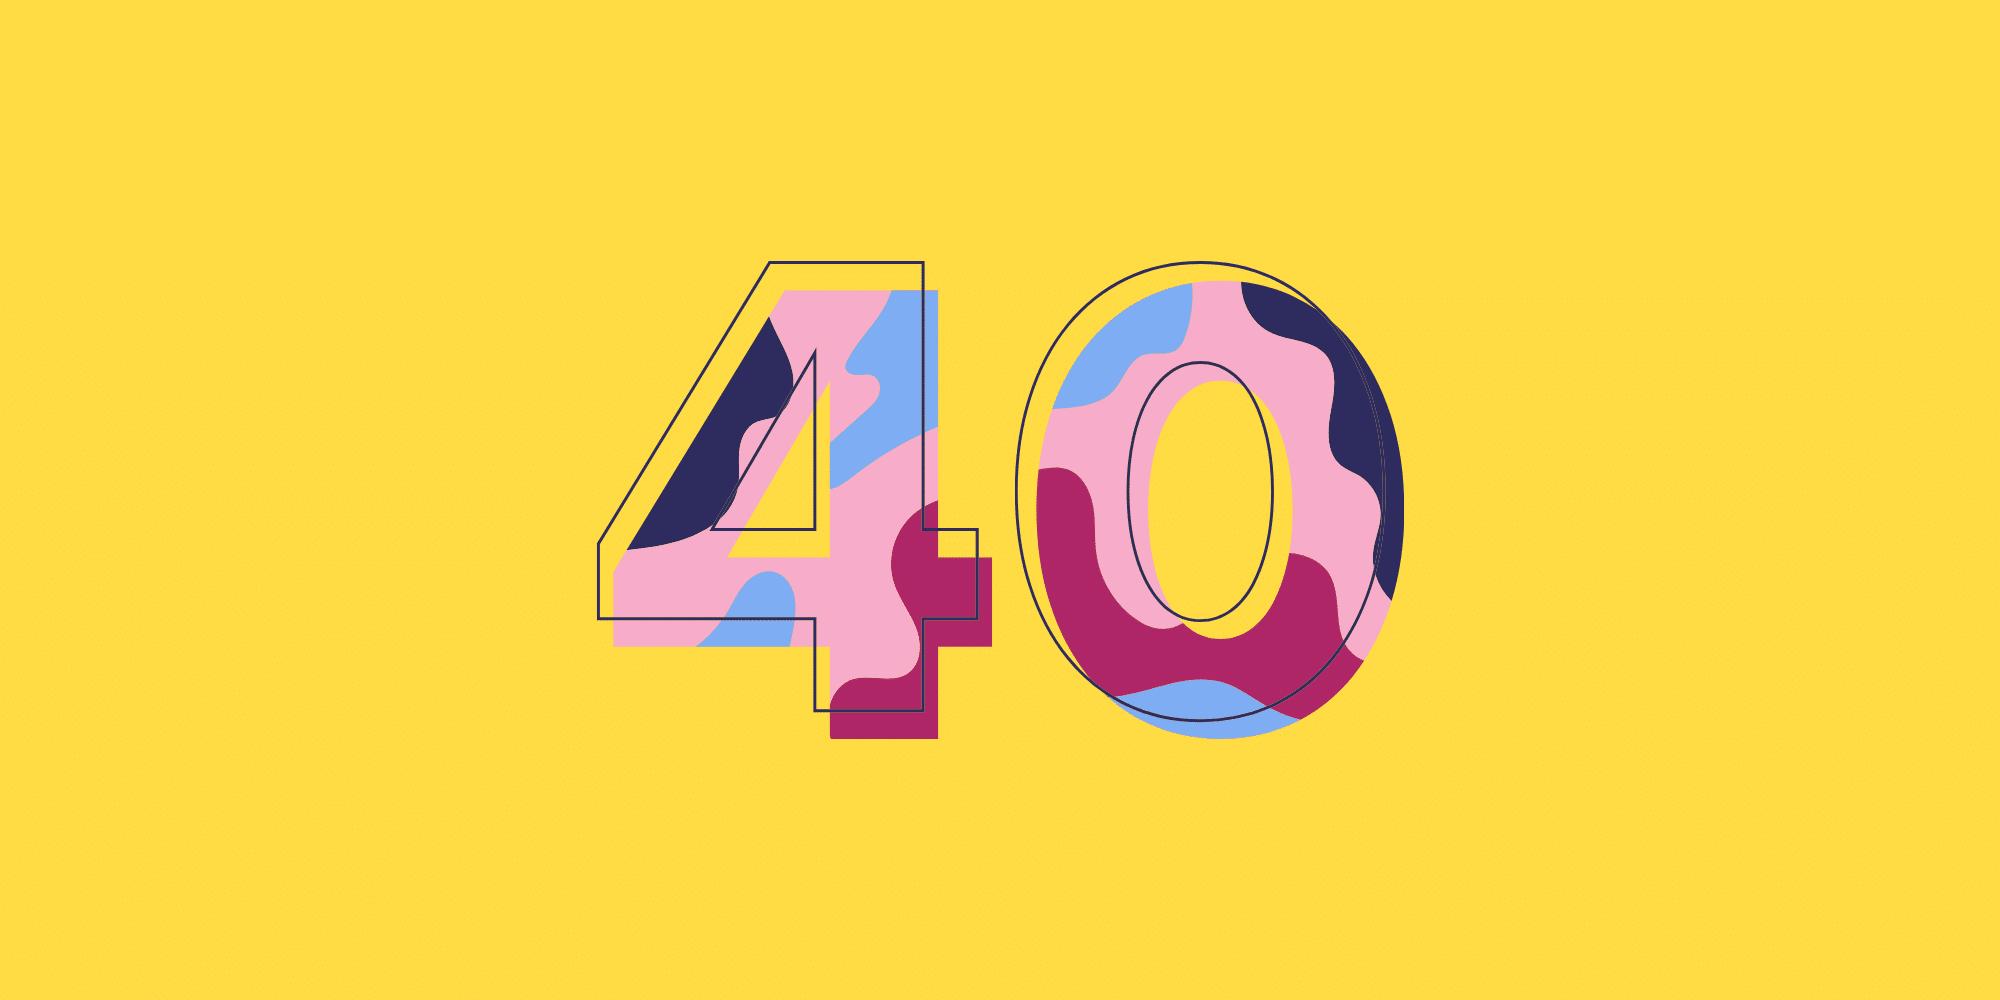 40th-birthday-gift-ideas